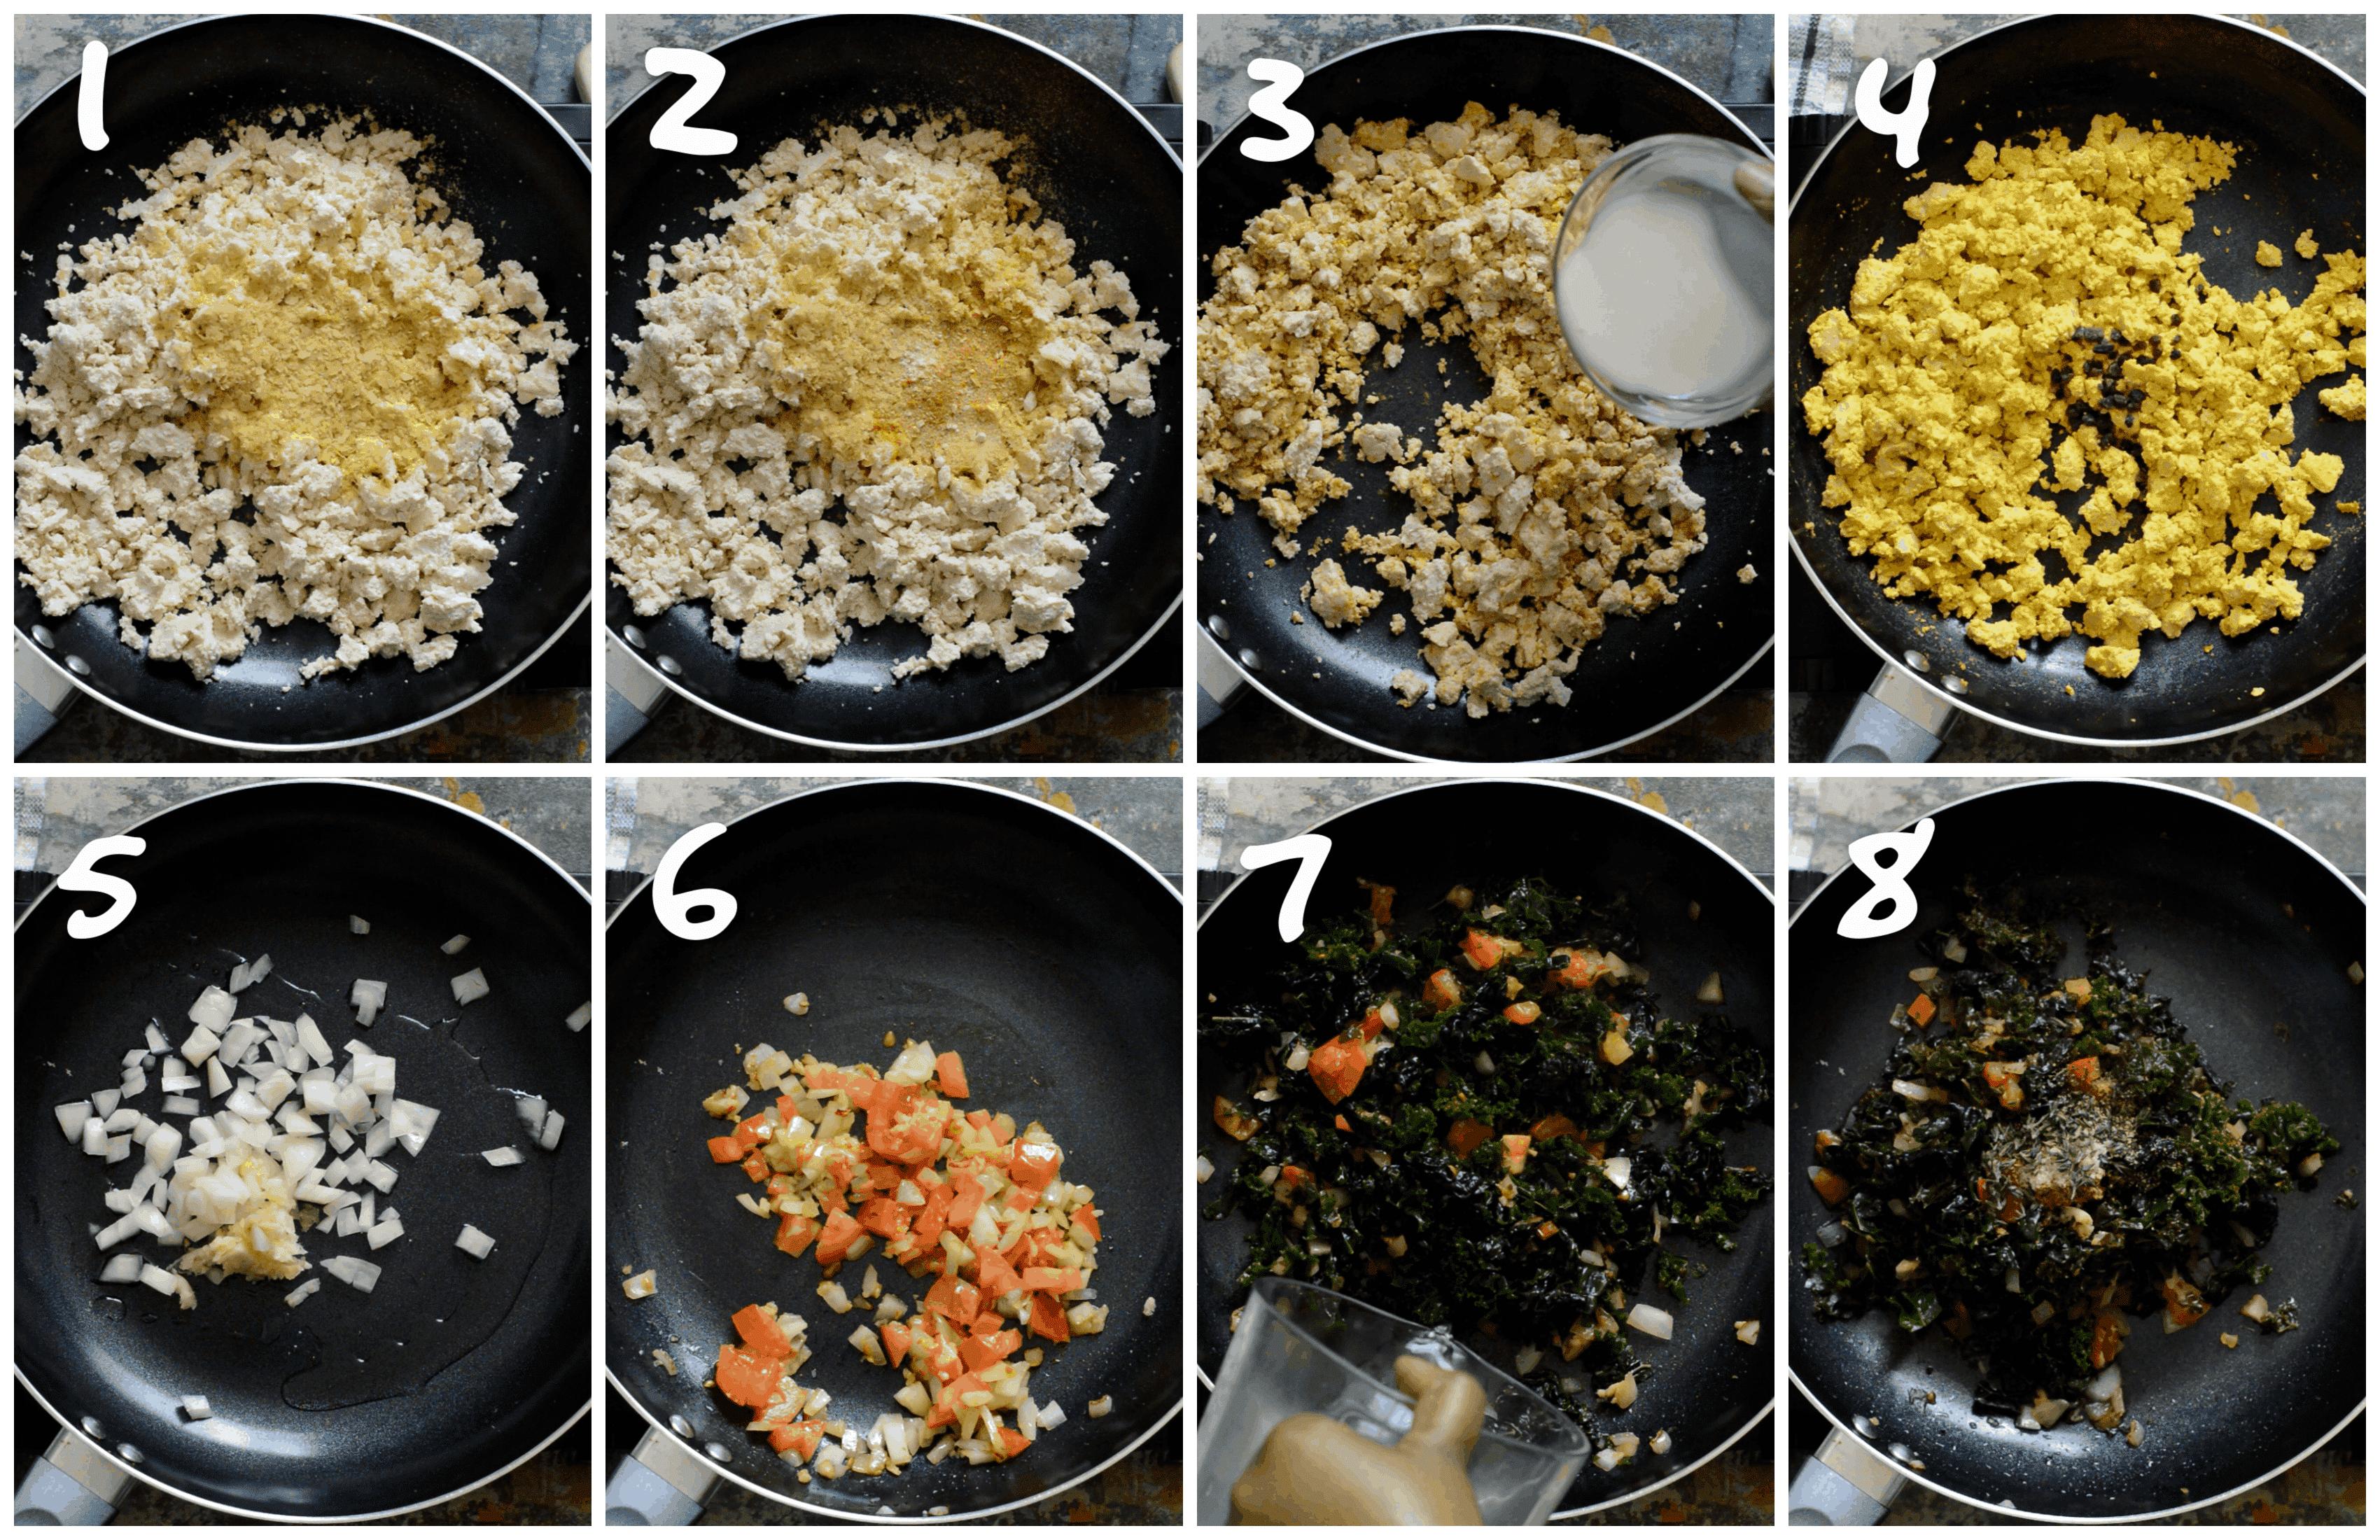 steps1-8 scrambling the tofu and sautéing the greens